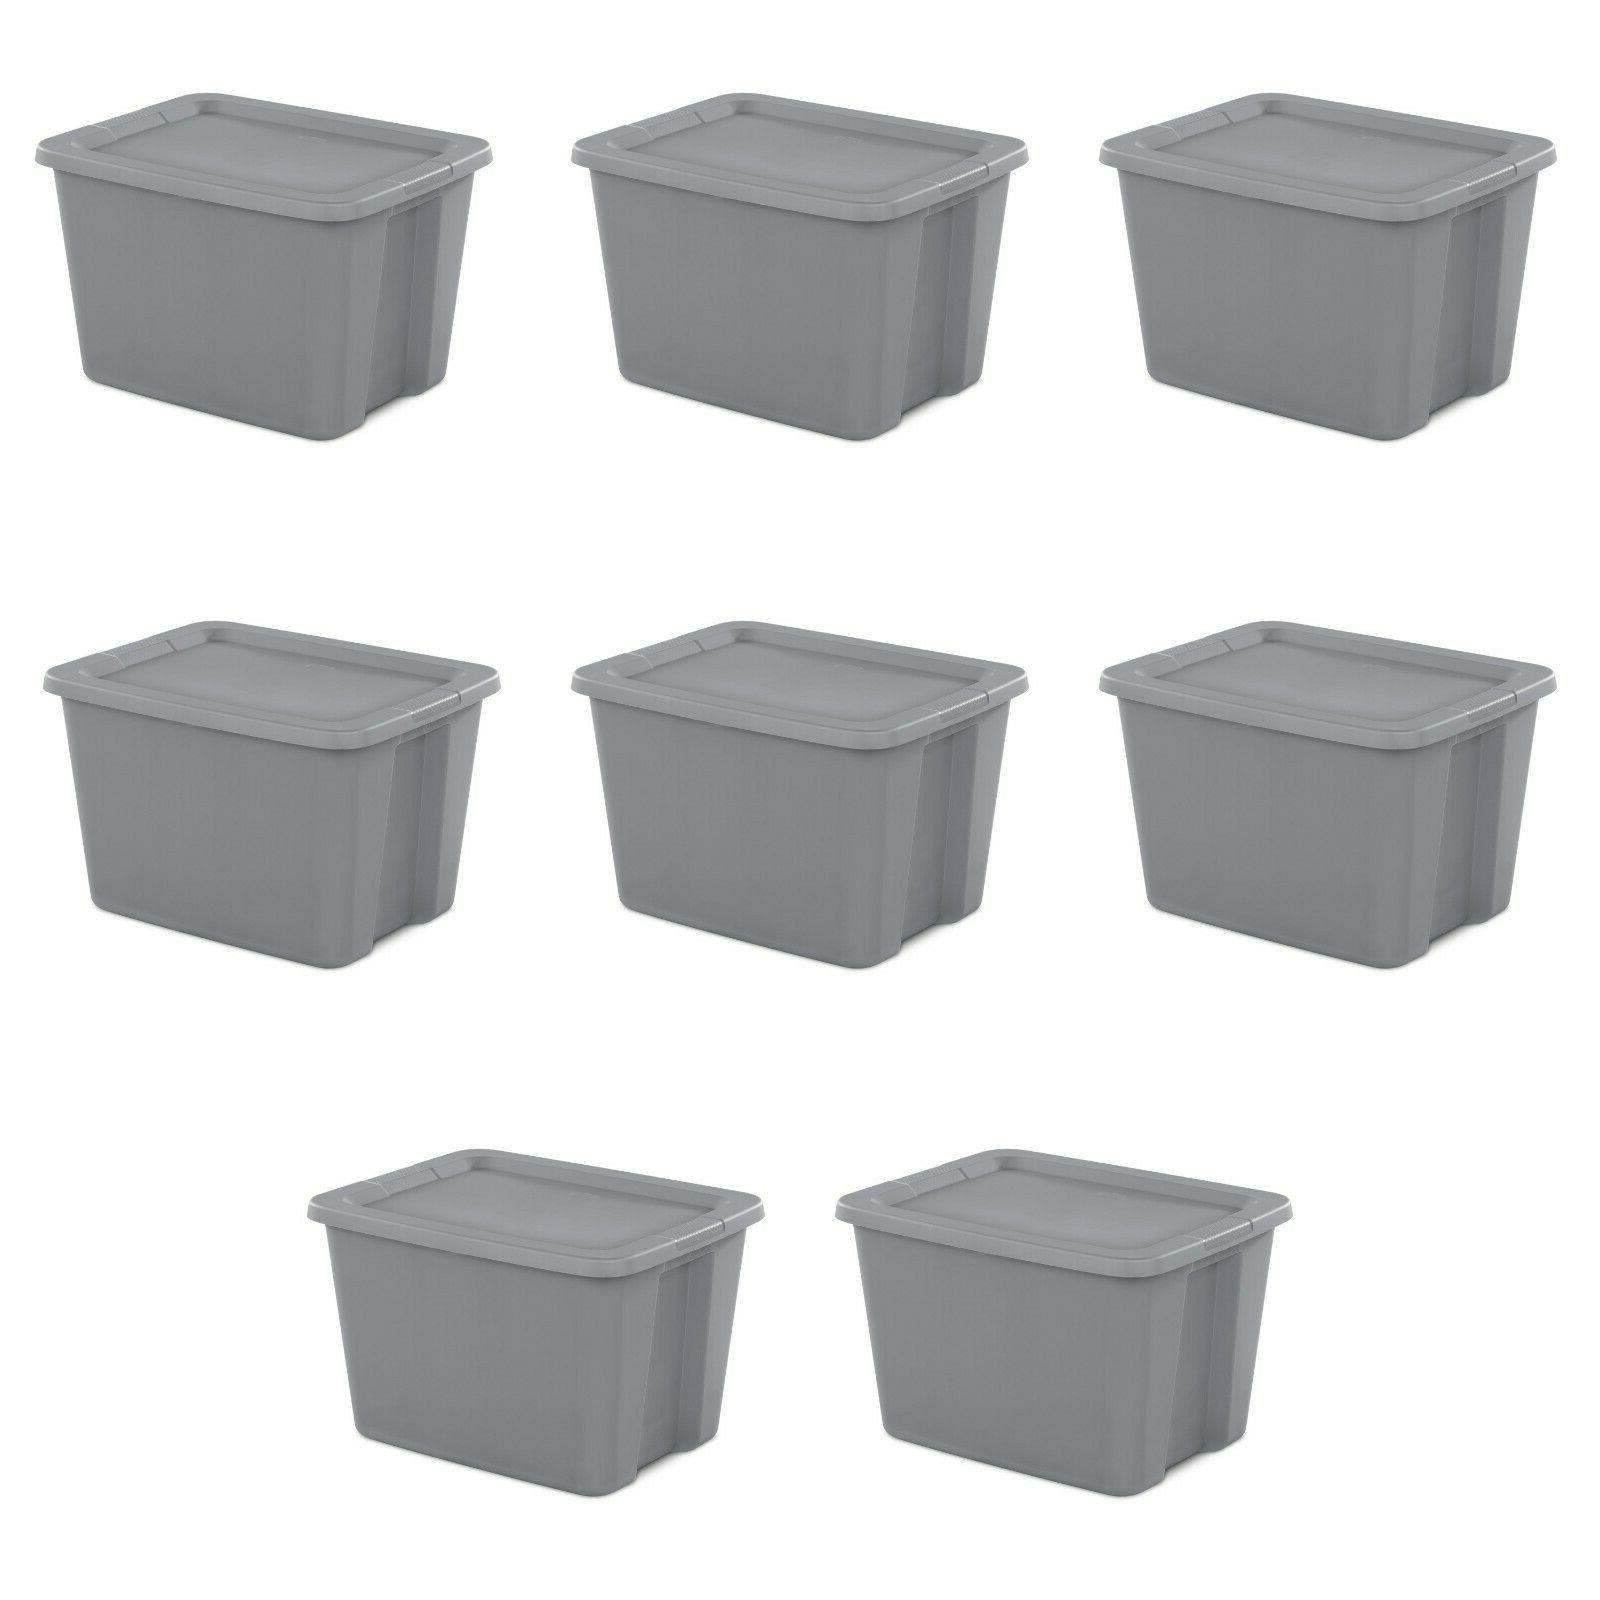 8 pk plastic storage container box set